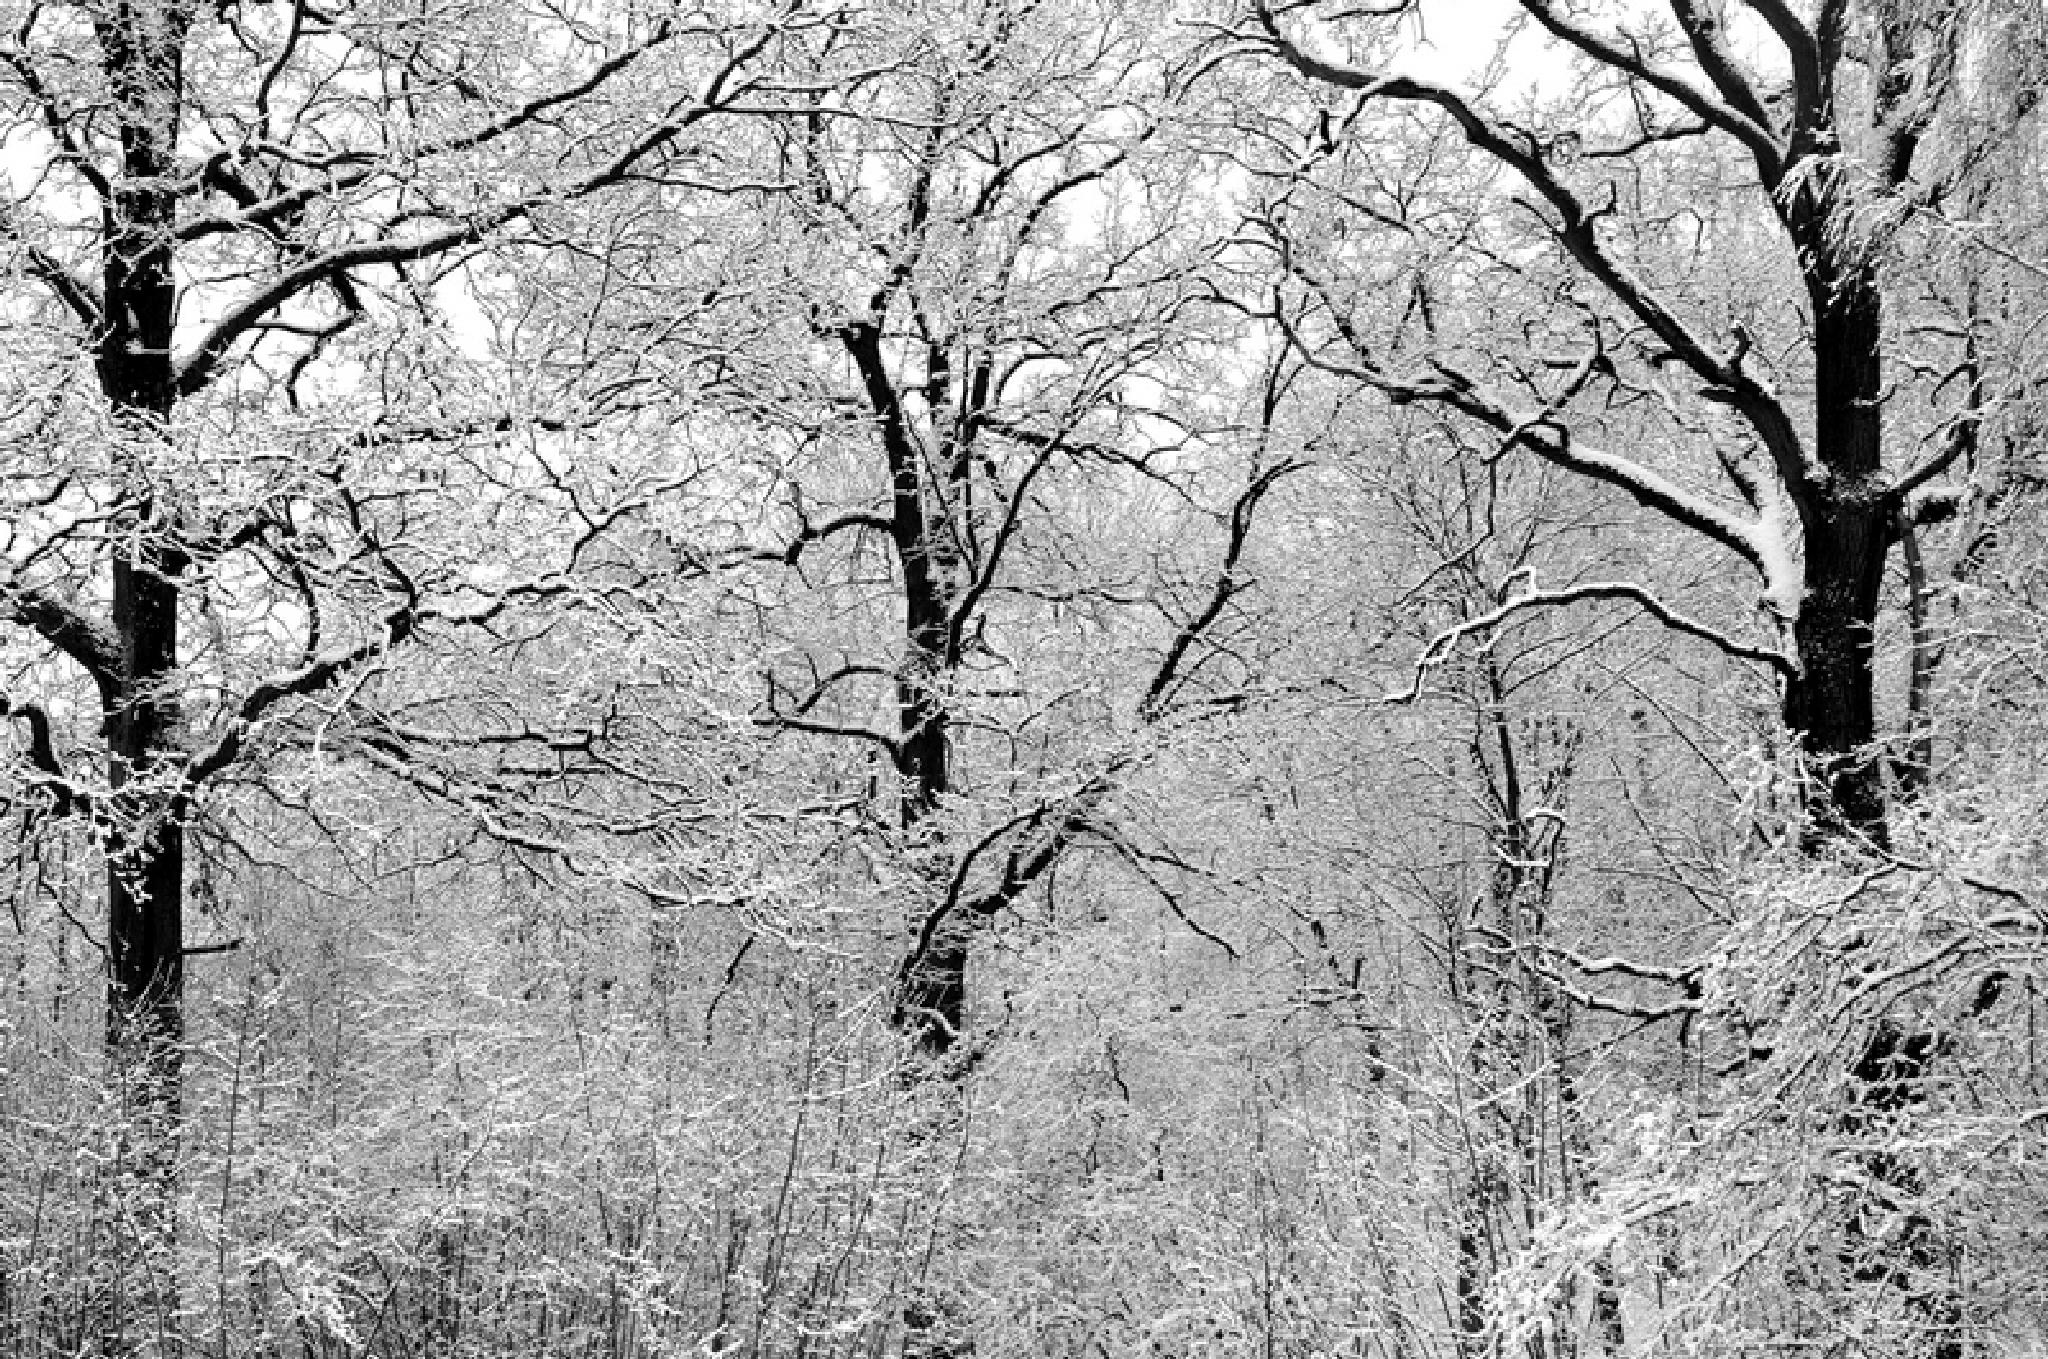 Winter Graphic by stanislovas kairys